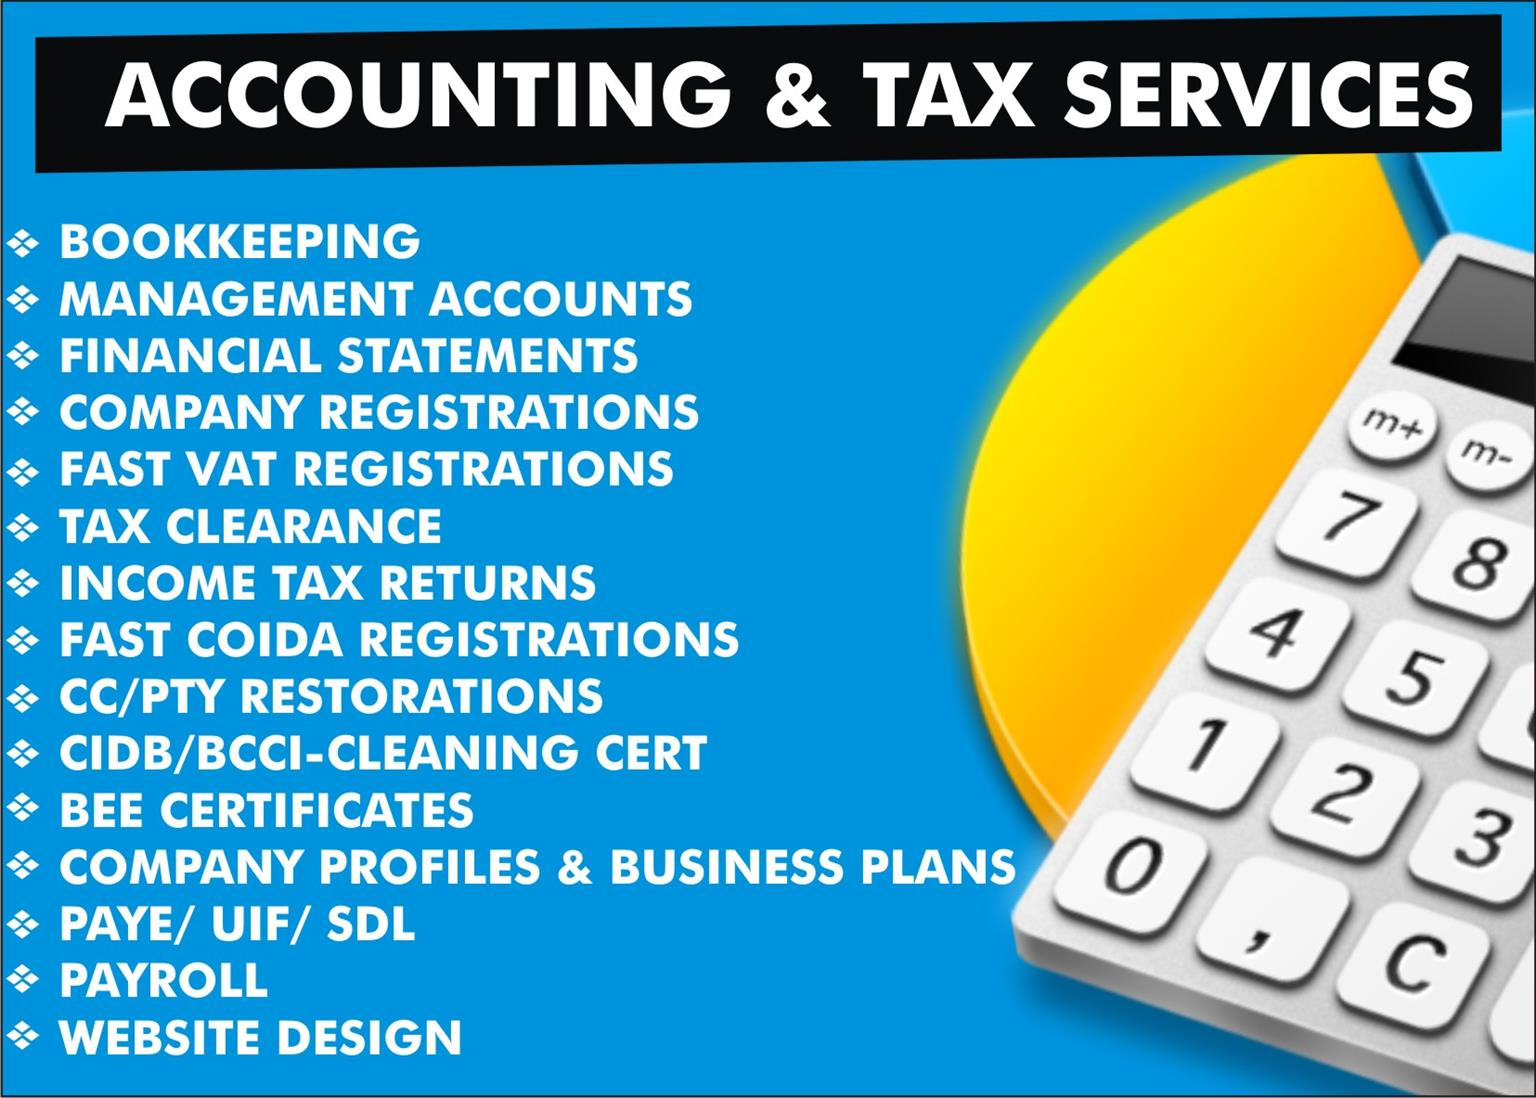 SHELF COMPANIES WITH VAT NO., TAX CLEARANCE, FAST VAT REG & COMPANY REG, ⁰AFS